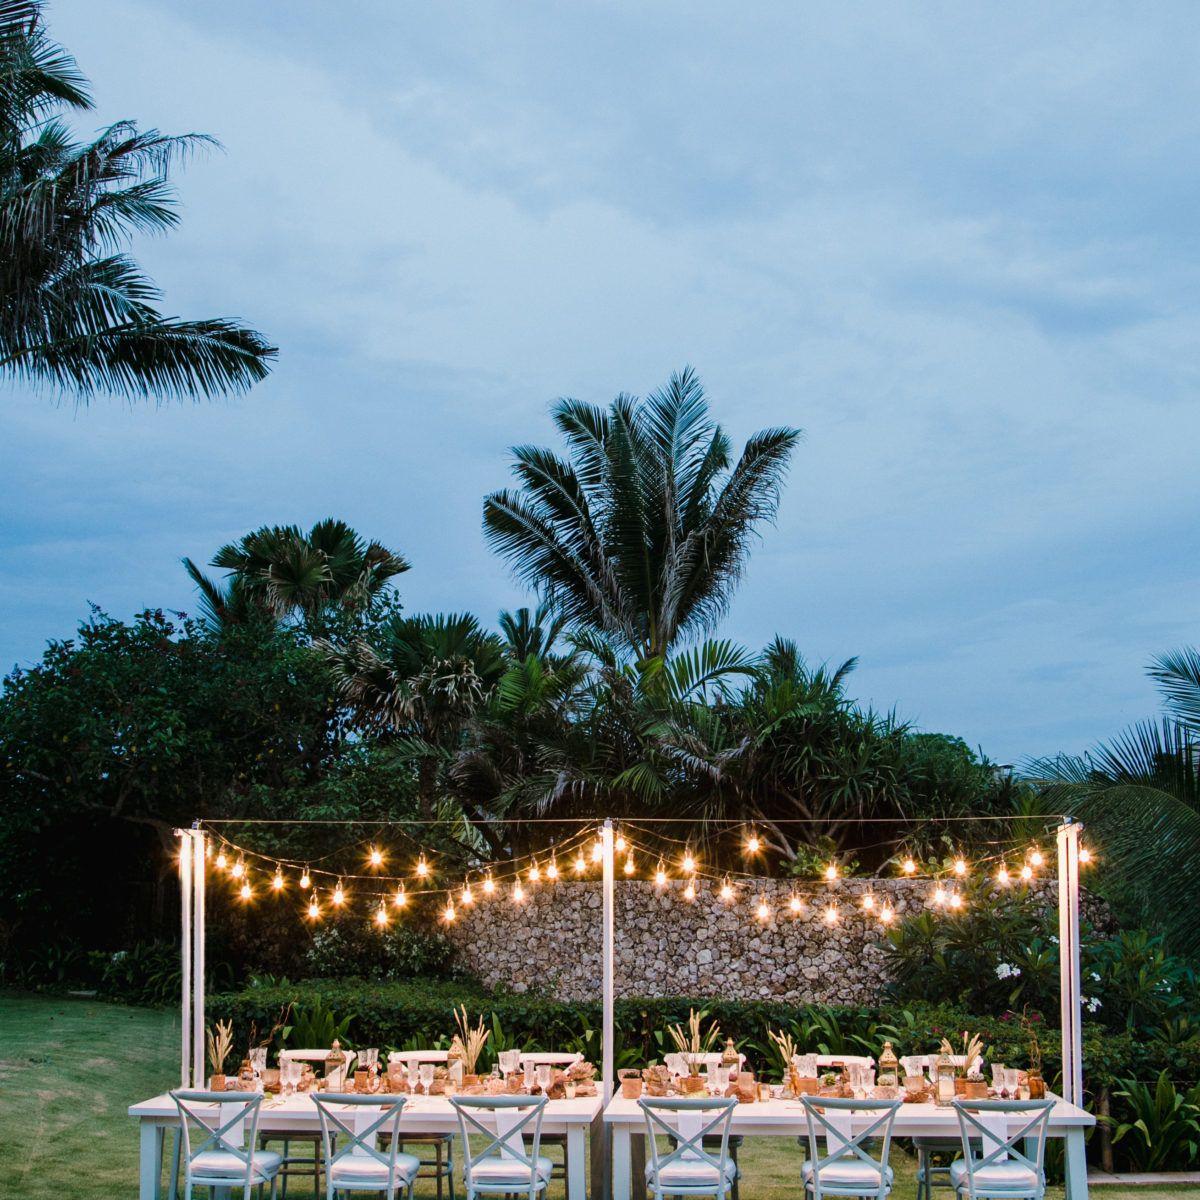 Bali Wedding ideas   Long table tropical lush foliage   Hanging globes